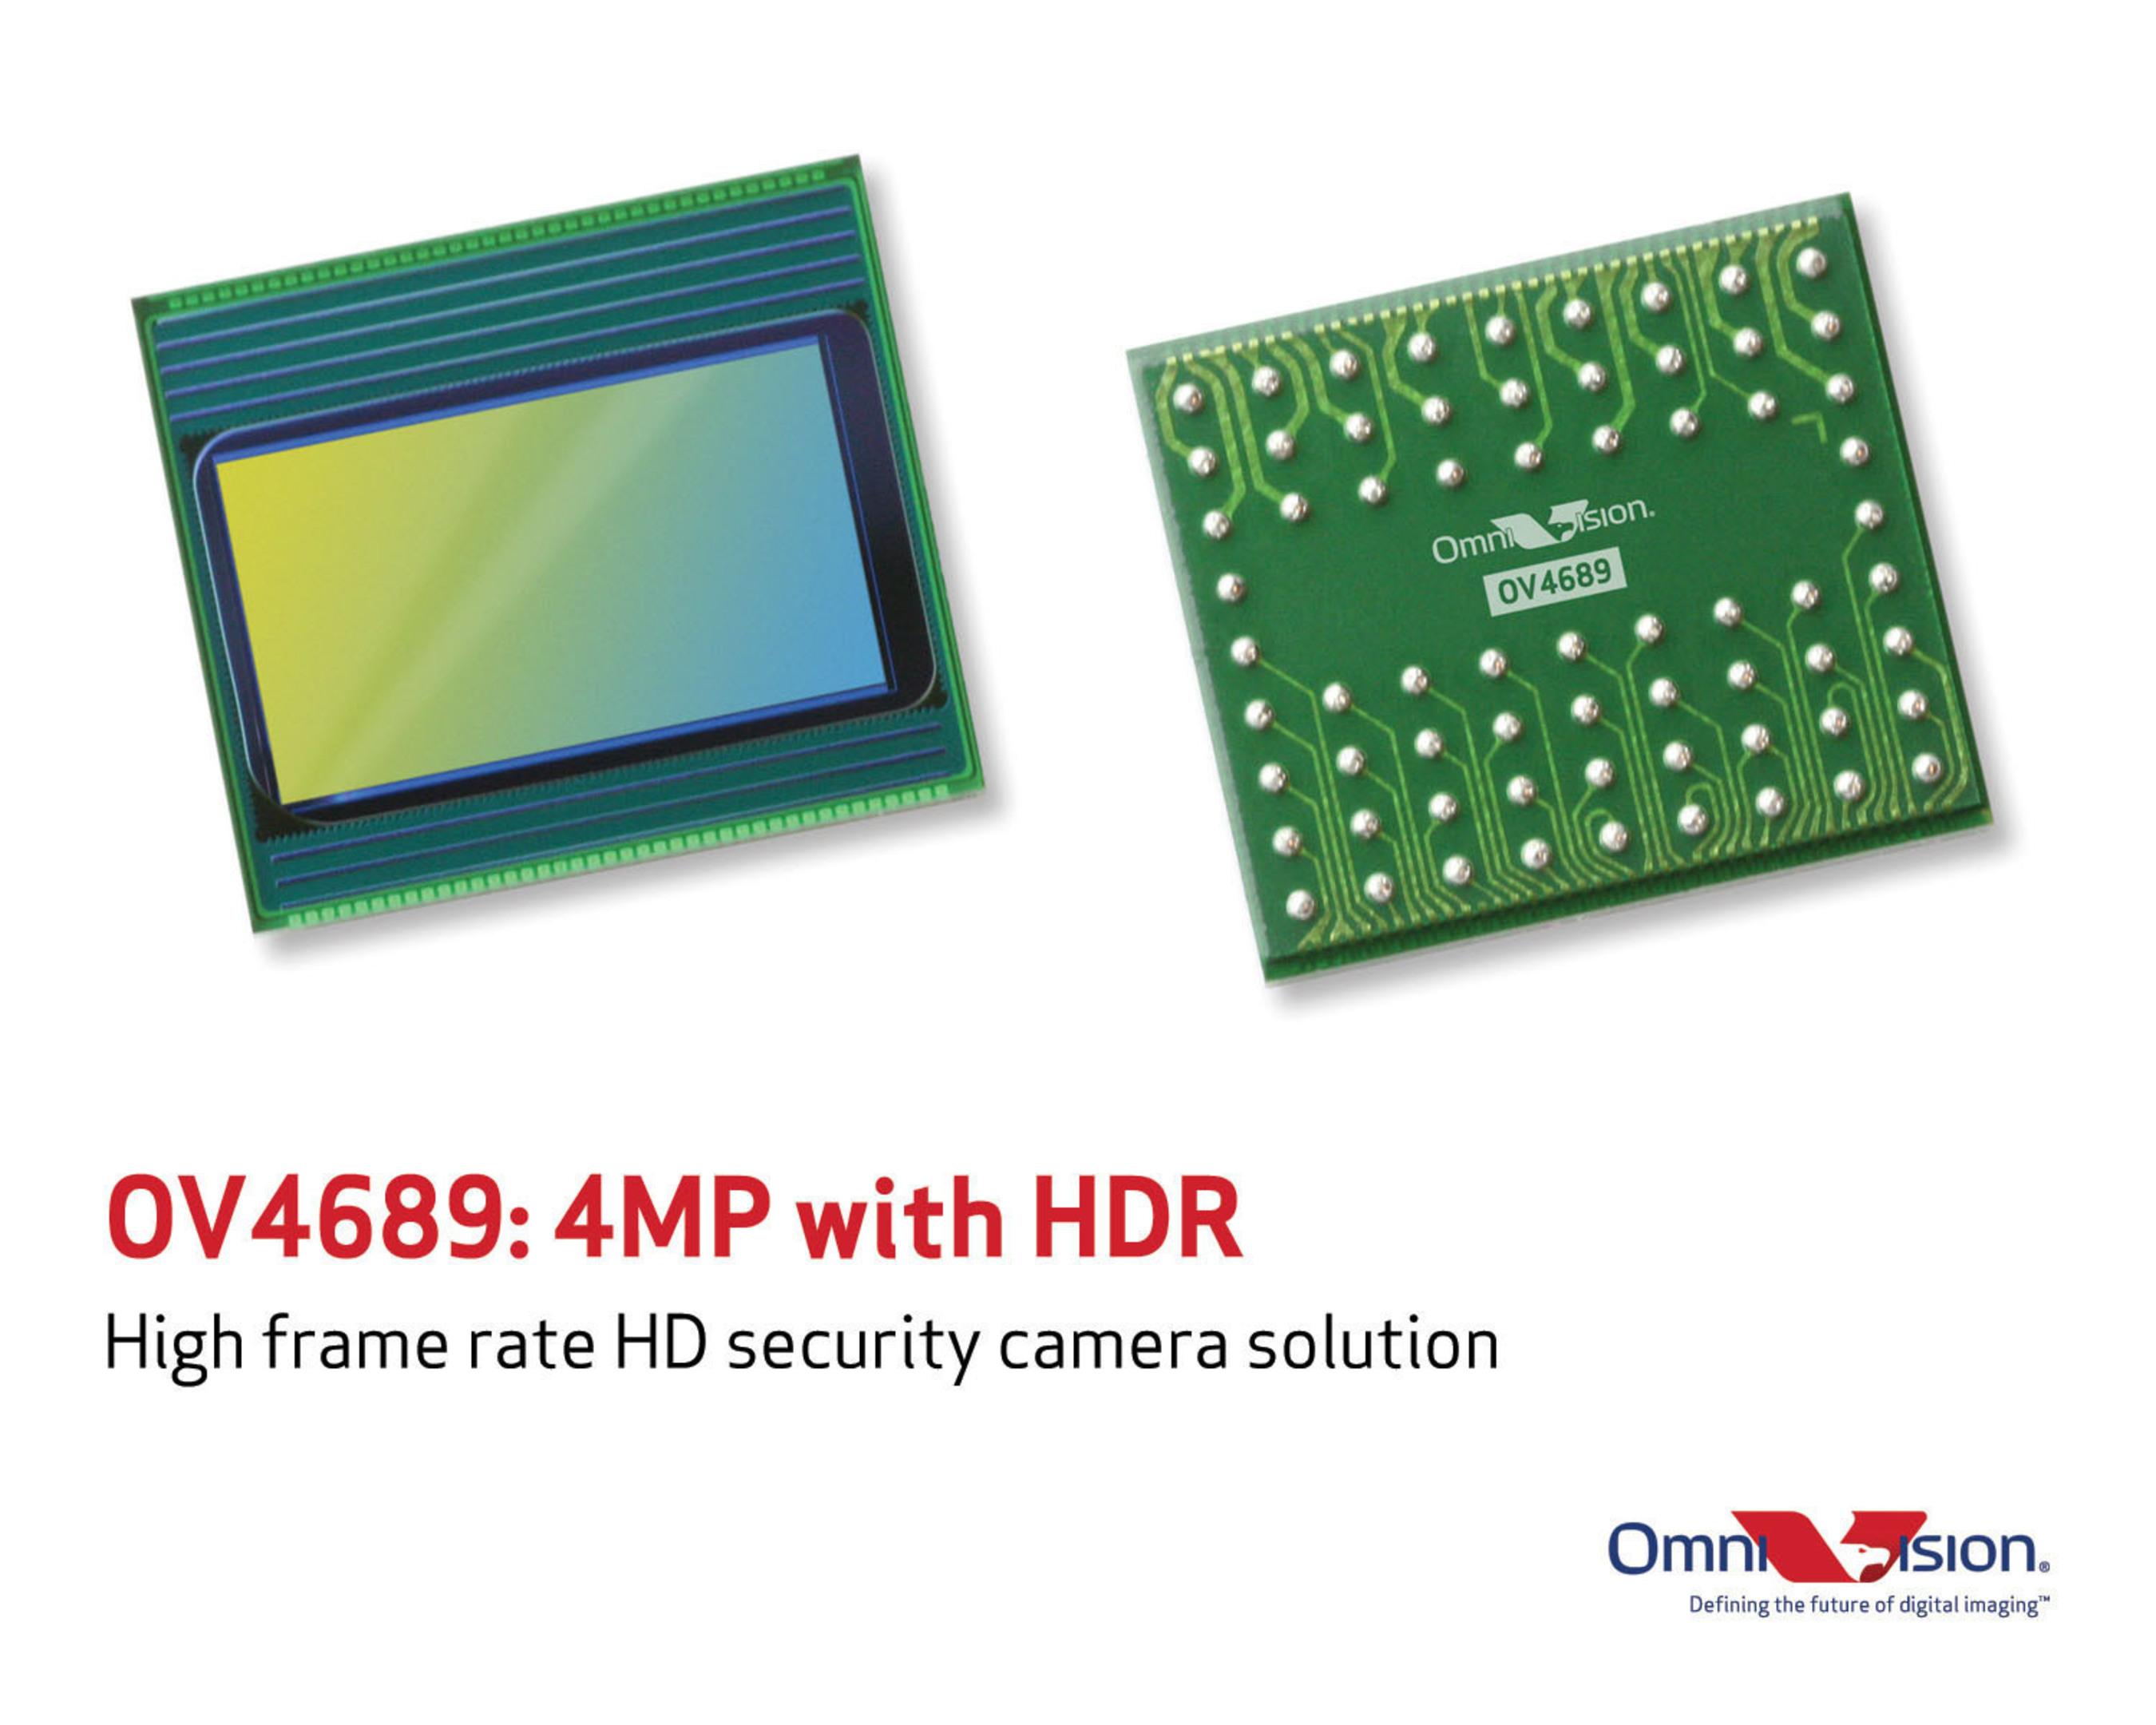 OV4689: High frame rate HD security camera solution. (PRNewsFoto/OmniVision Technologies, Inc.) ...